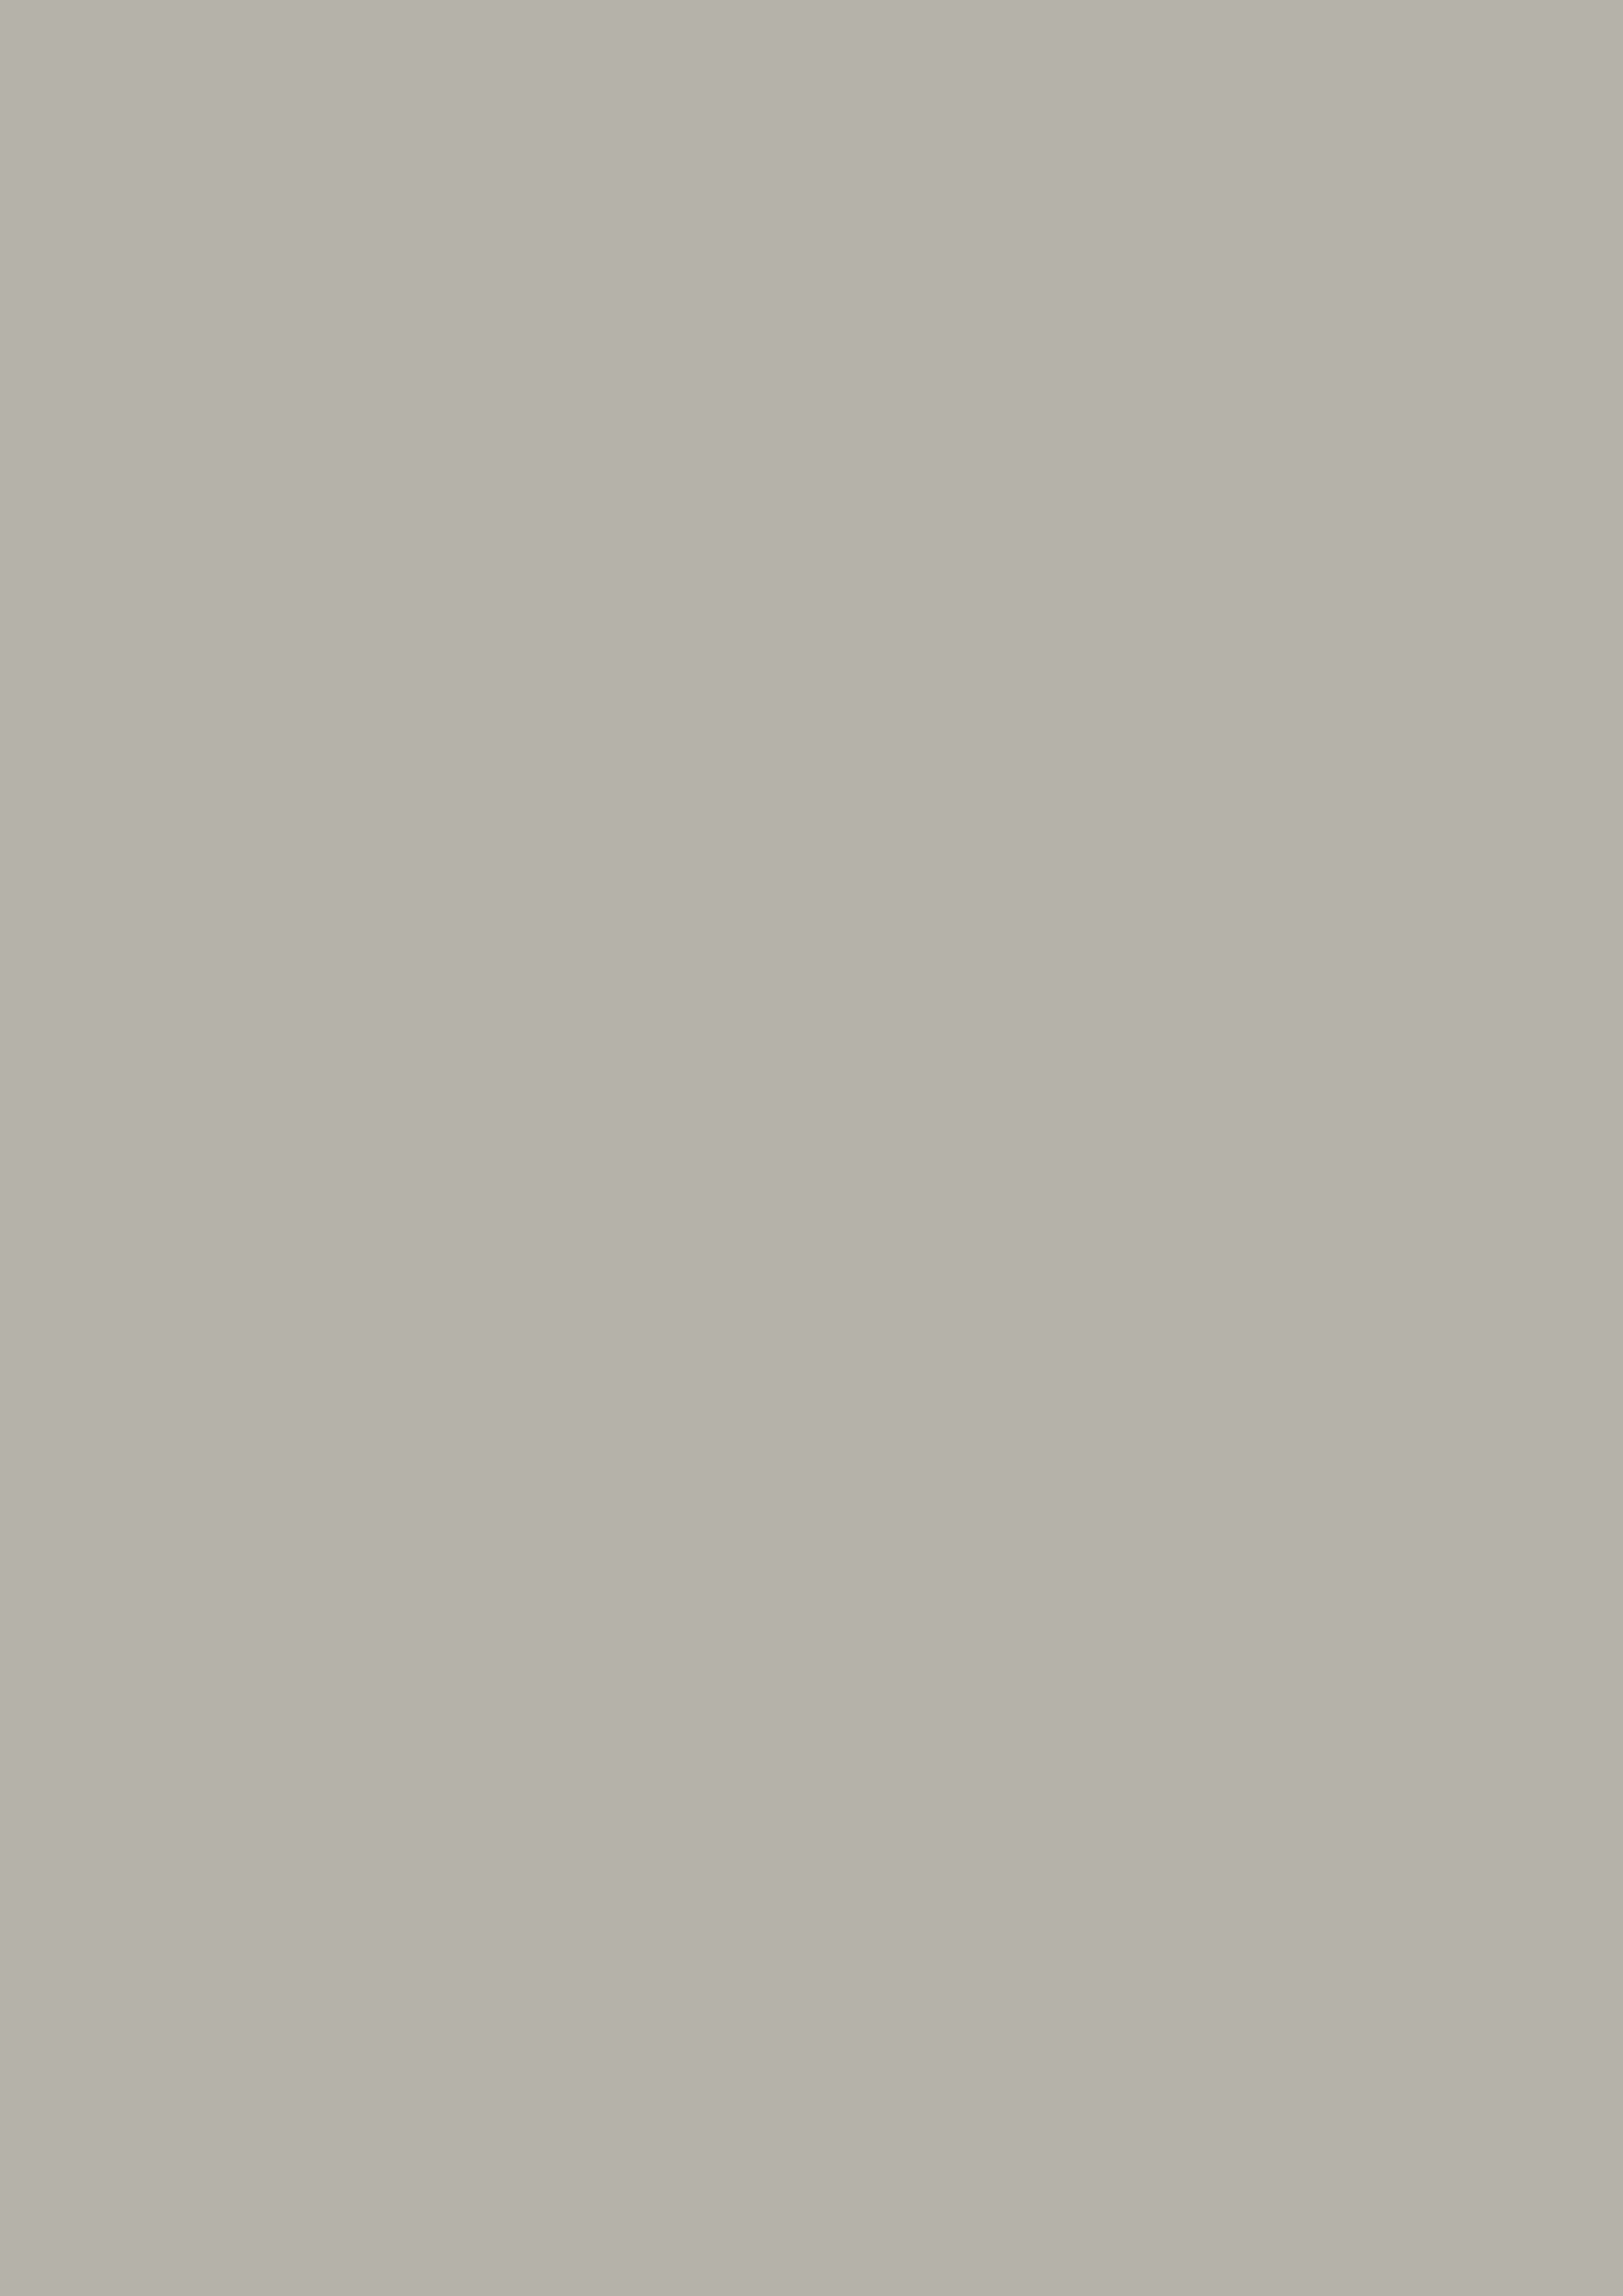 lamp room gray nr 88 farrow and ball adler wohndesign. Black Bedroom Furniture Sets. Home Design Ideas